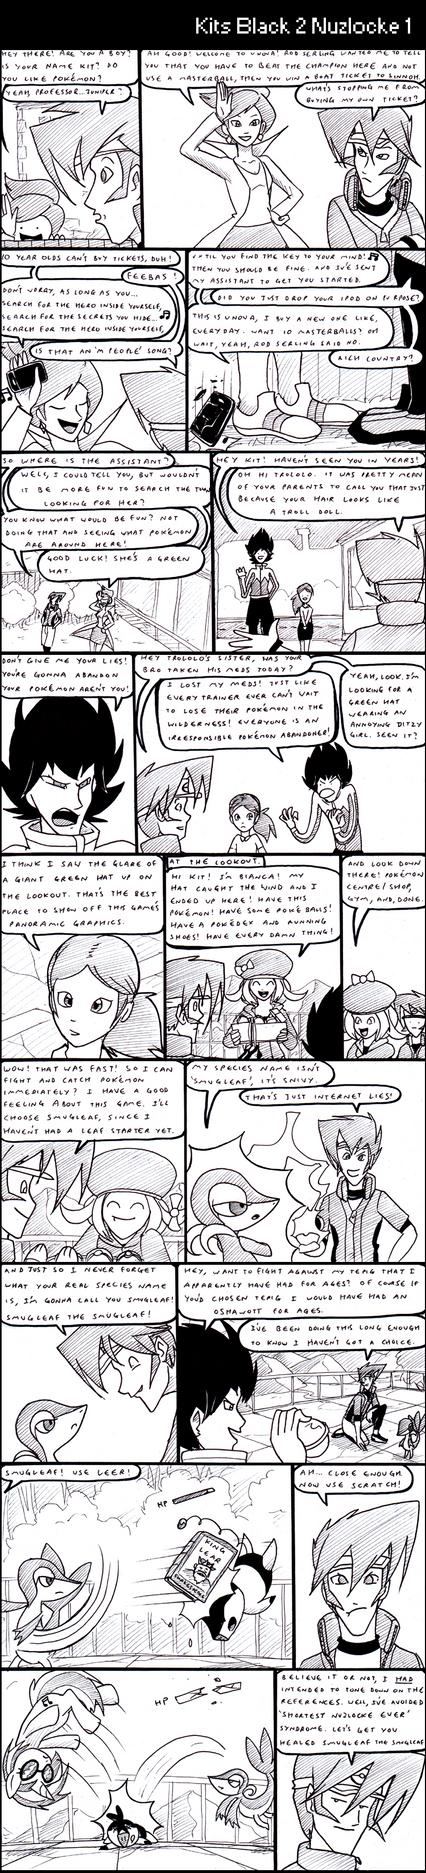 Kit's black 2 page 1 by kitfox-crimson